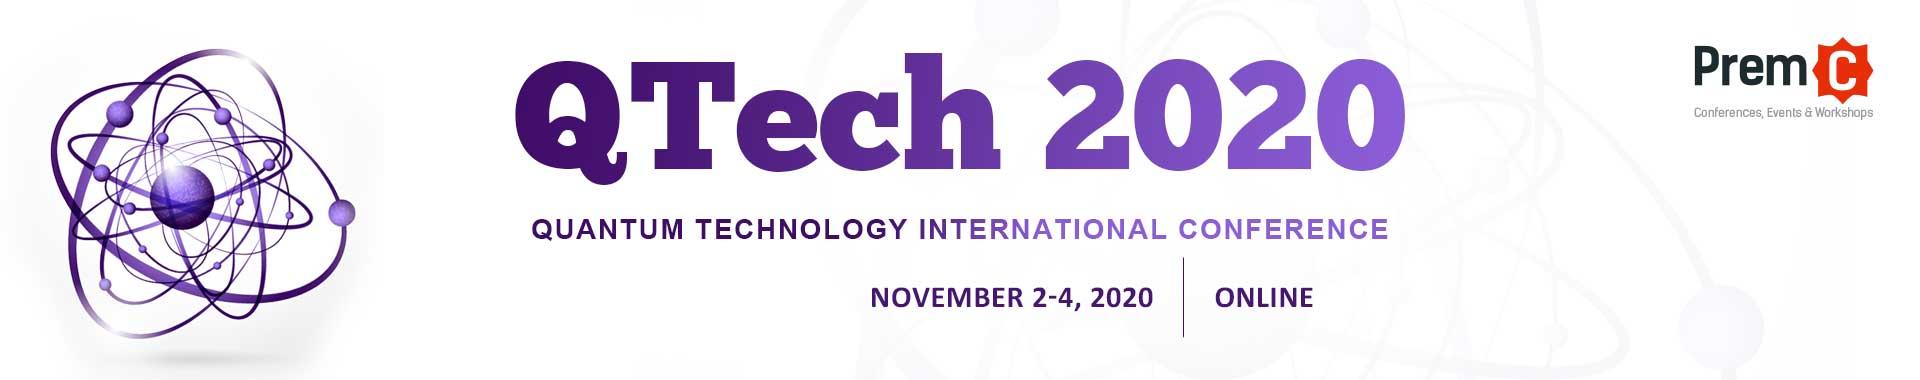 Quantum Technology International Conference Banner